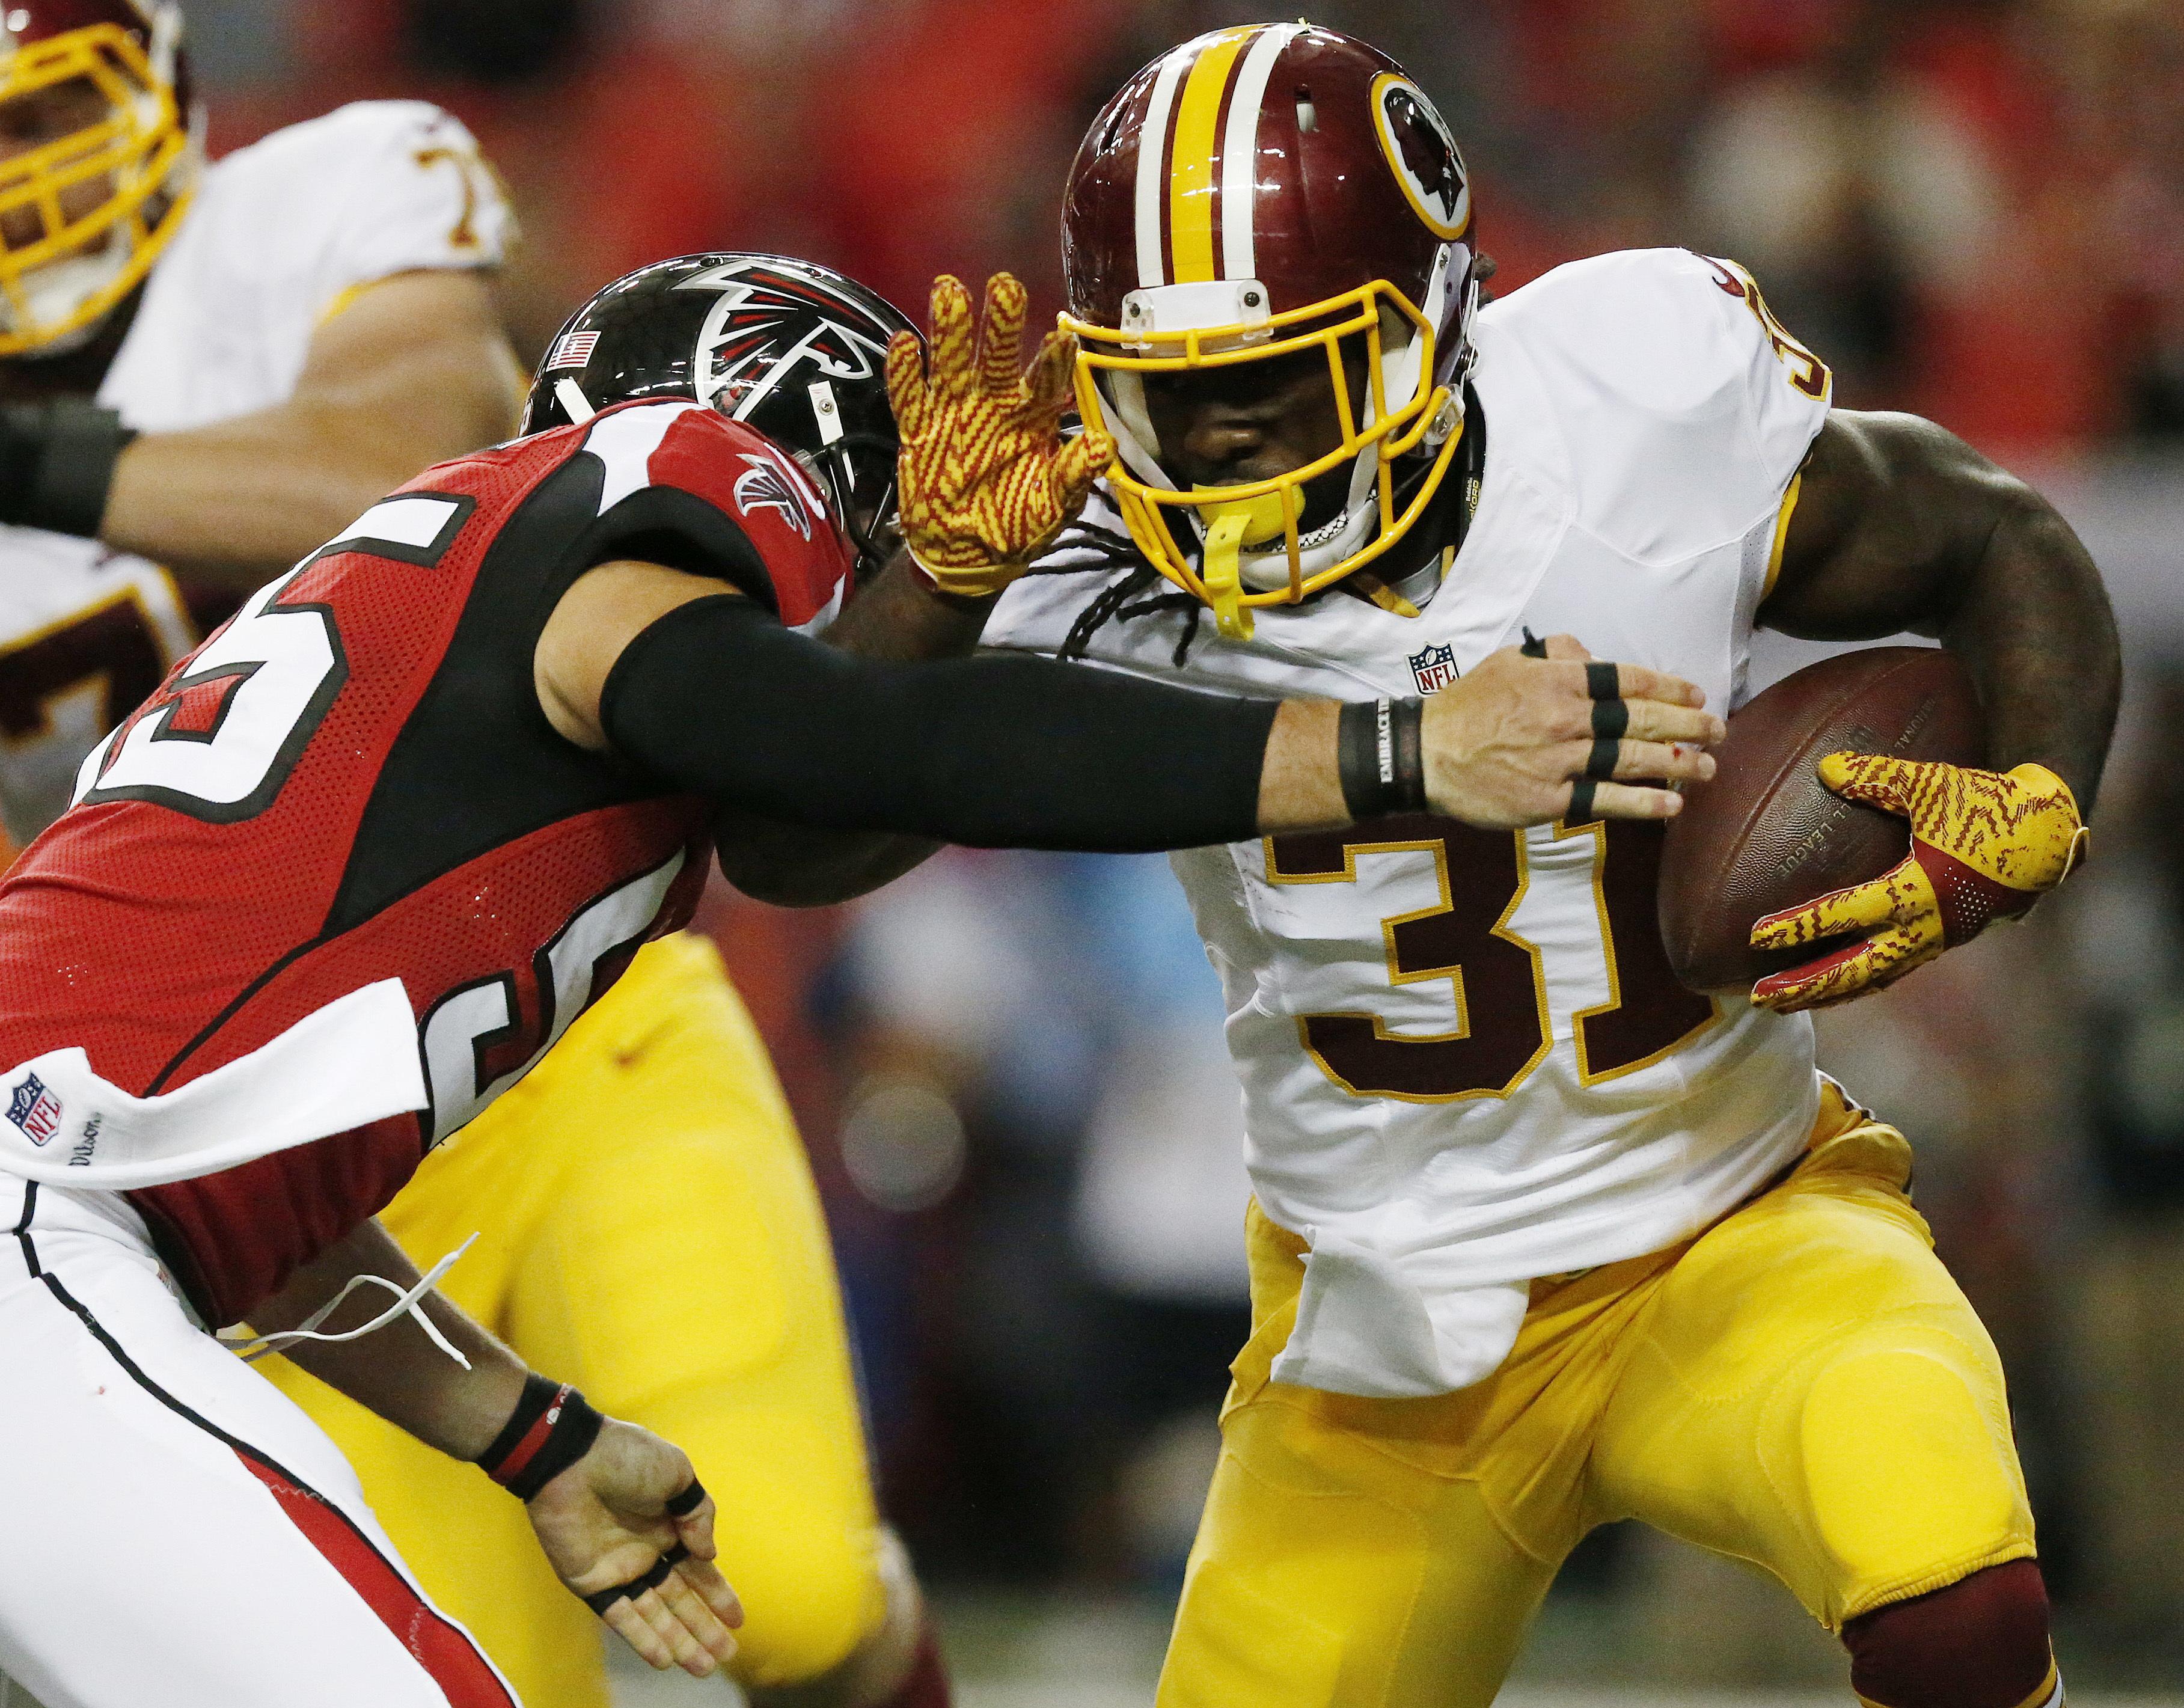 Washington Redskins running back Matt Jones (31) runs against Atlanta Falcons middle linebacker Paul Worrilow (55) during the first half of a preseason NFL football game, Thursday, Aug. 11, 2016, in Atlanta. (AP Photo/Brynn Anderson)